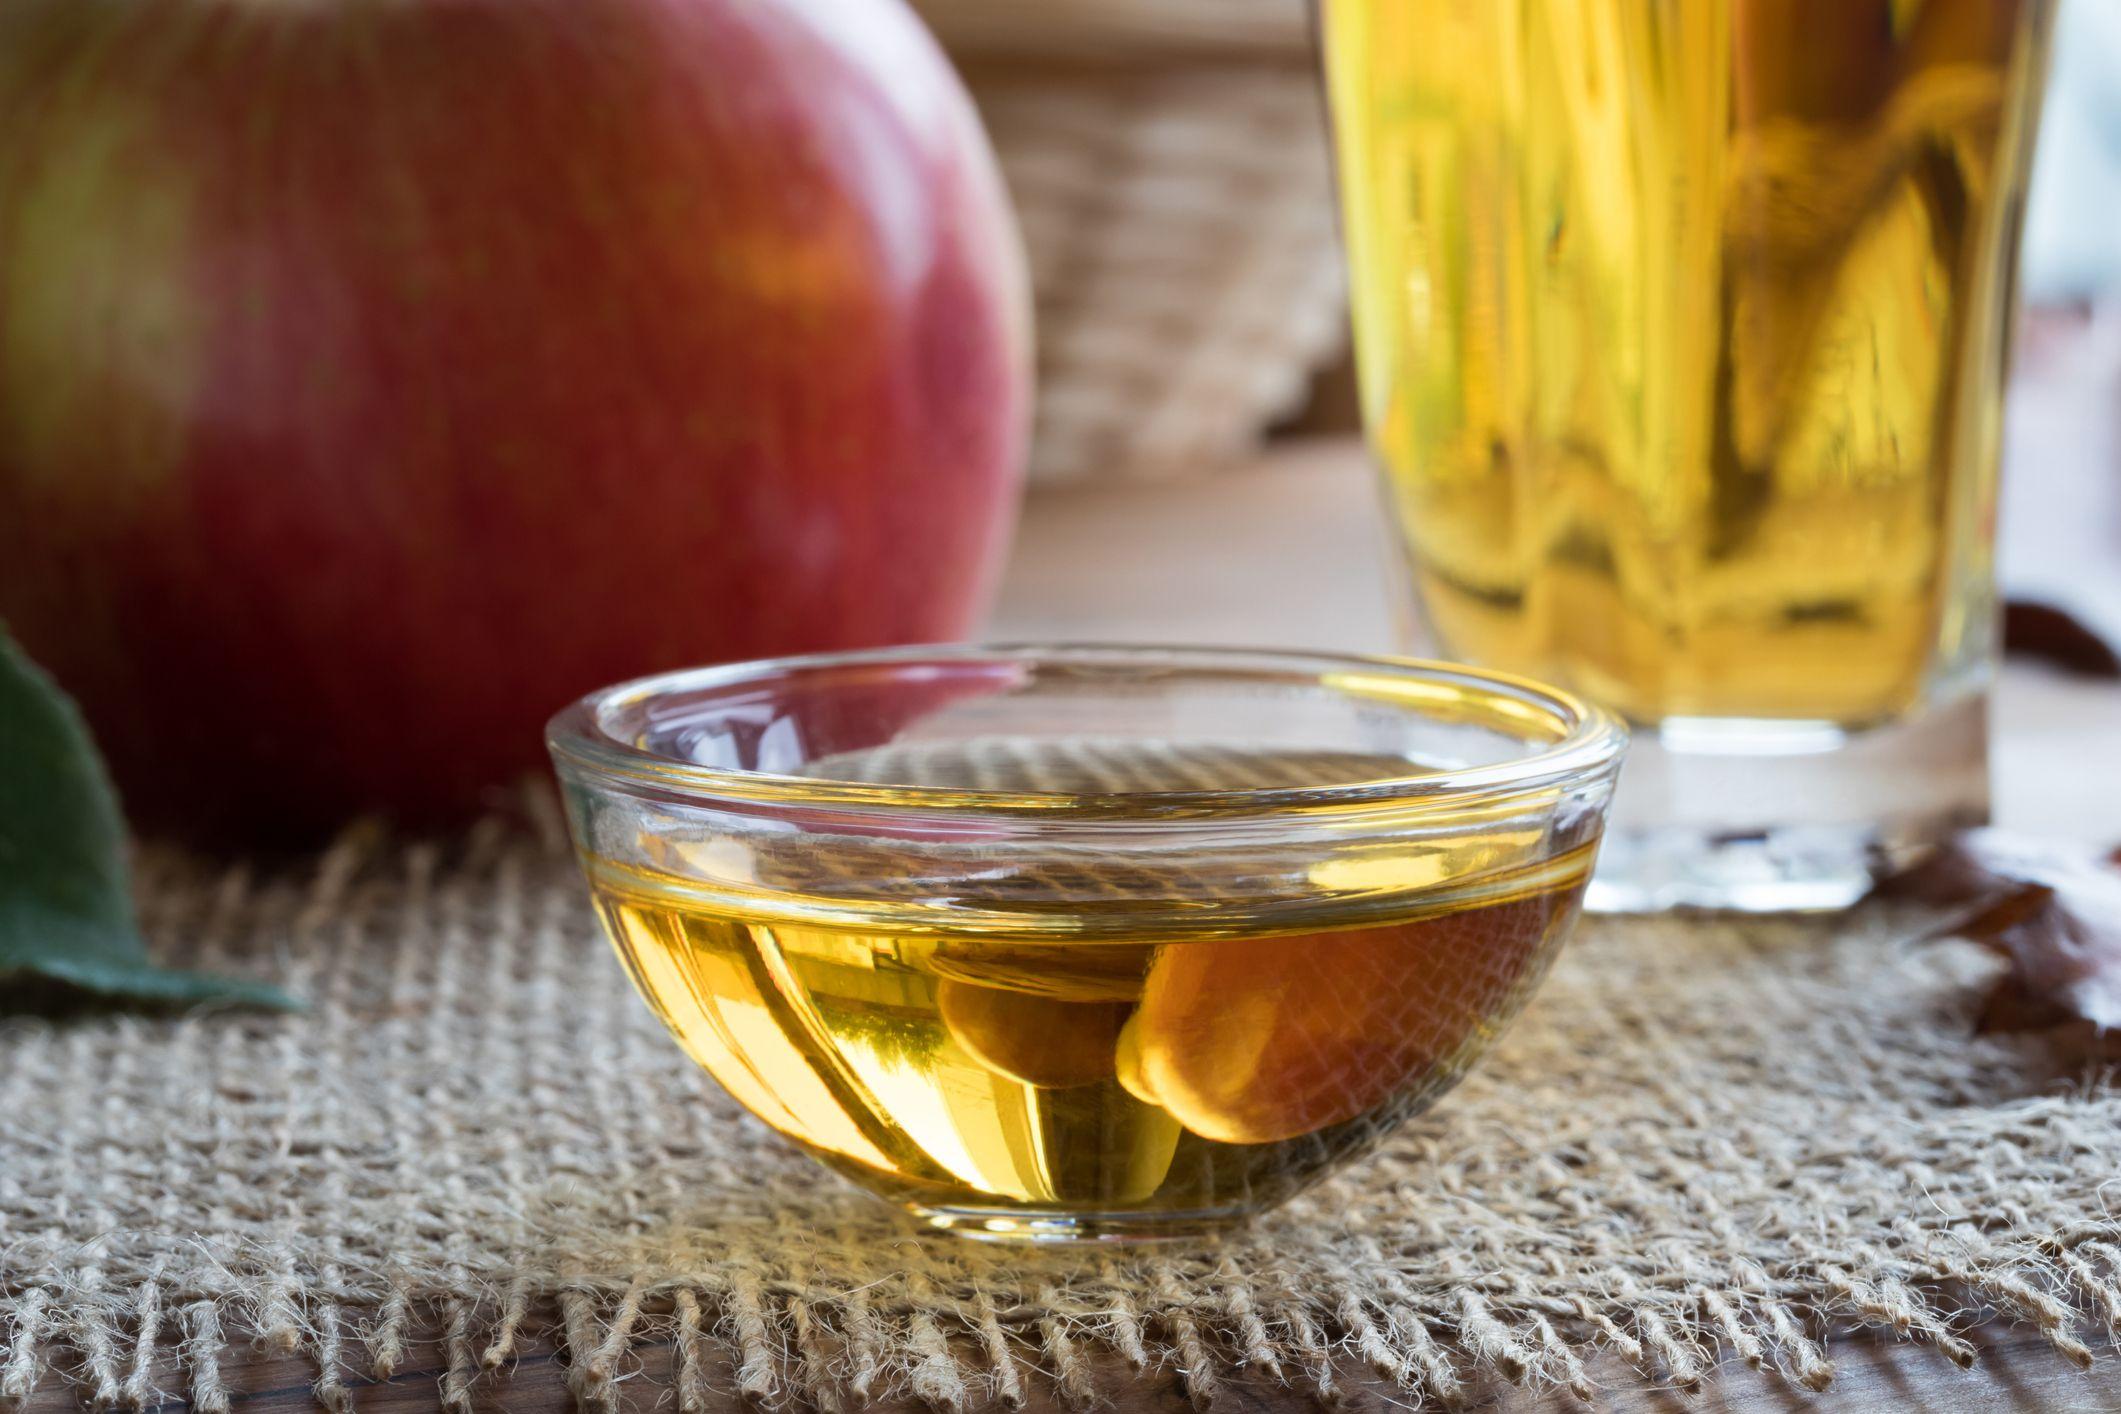 ACV Benefits | Is Drinking Apple Cider Vinegar Good for You?